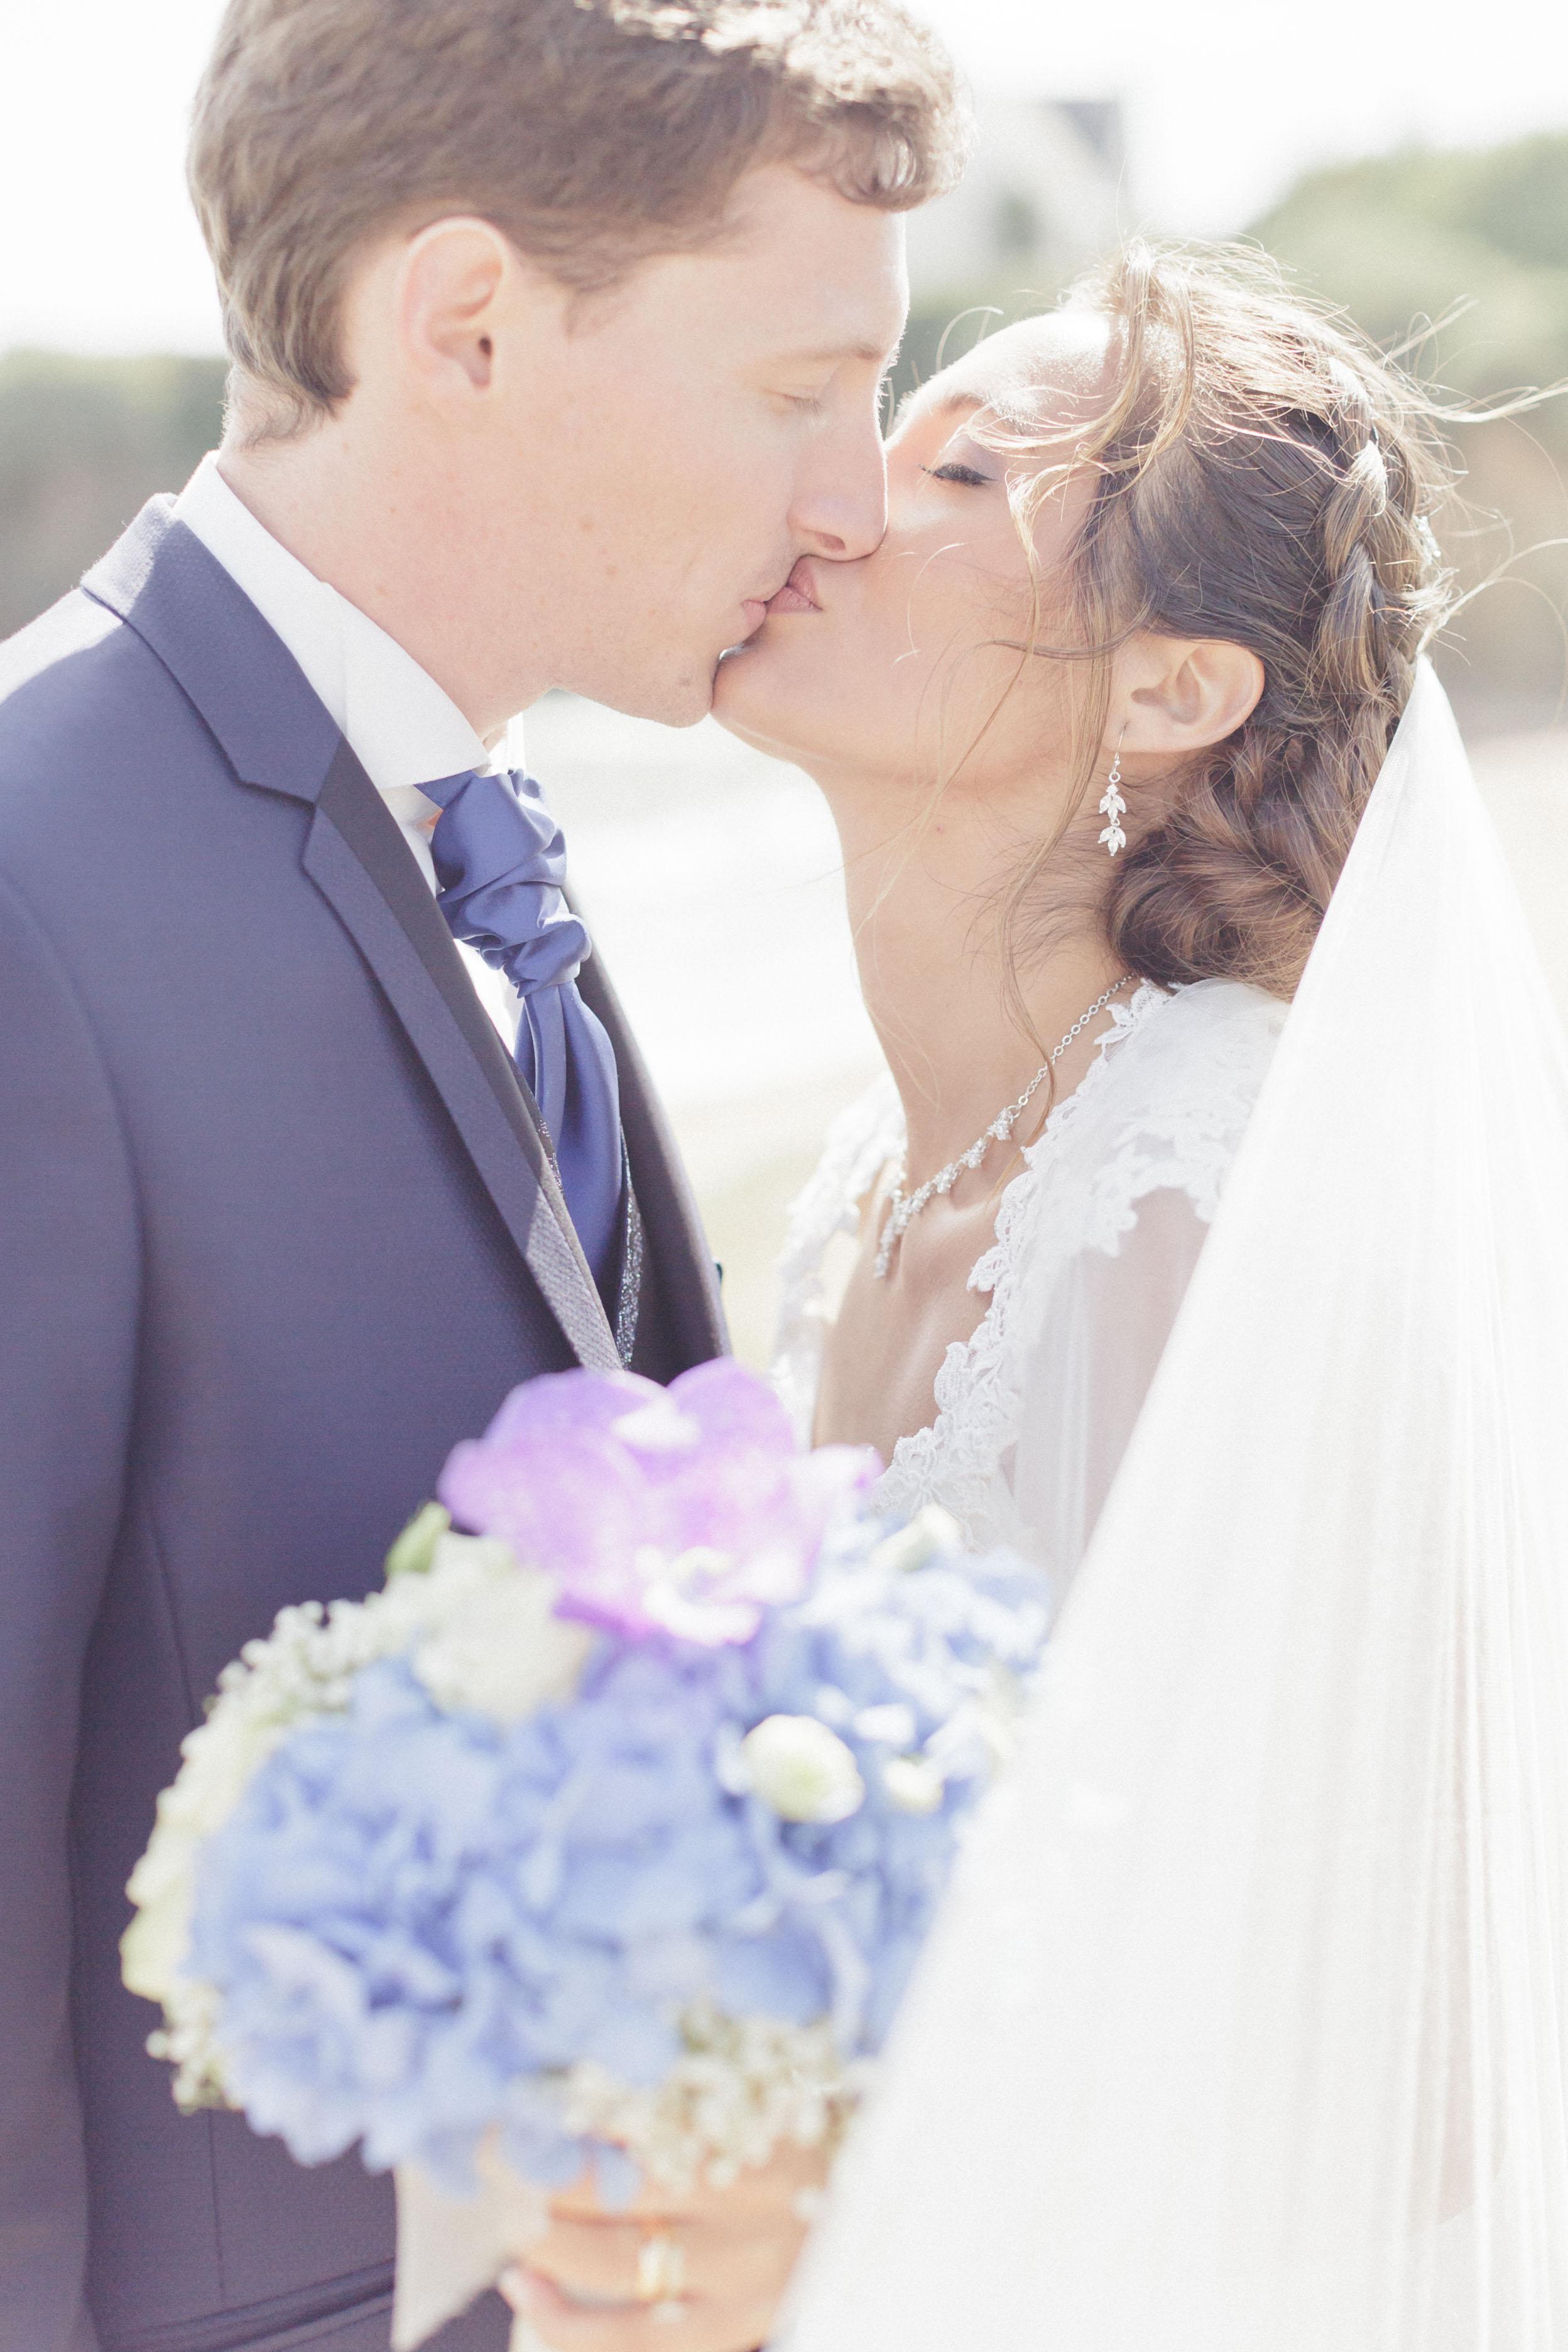 Photographie - Mariage - Bretagne - Finistere - Morbihan - Lilian Vezin Photographie (35)